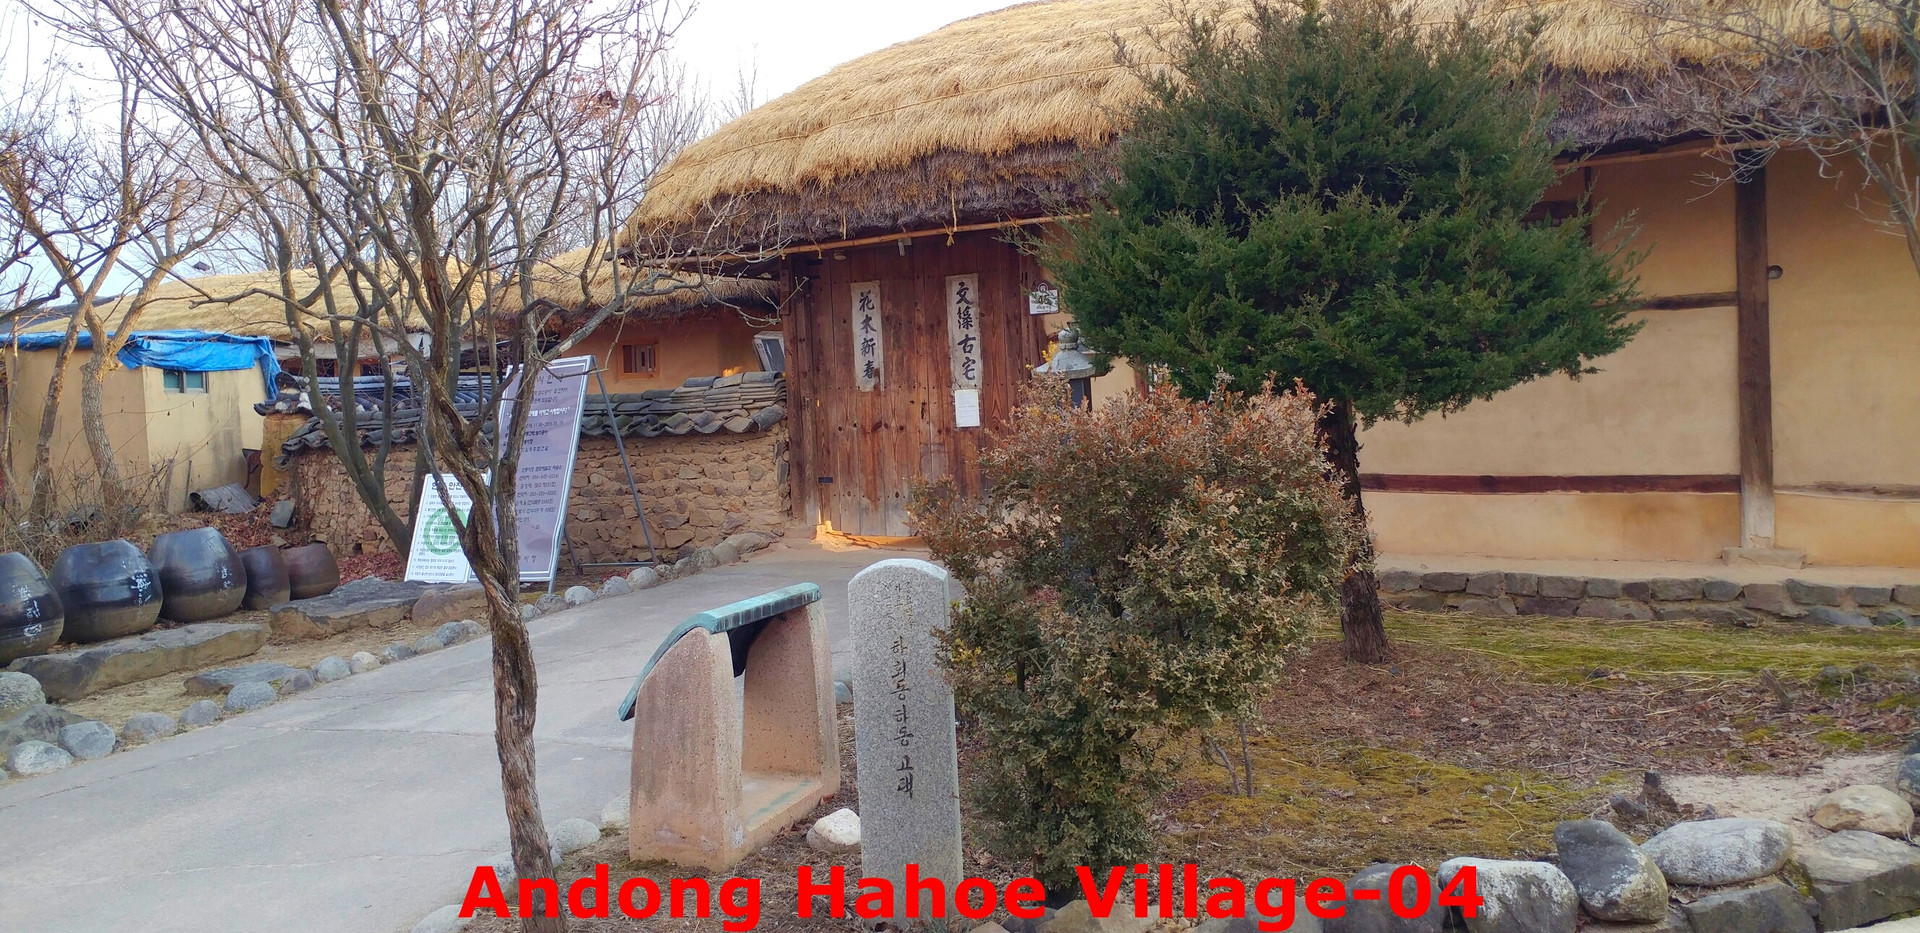 Andong Hahoe Village-04.jpg